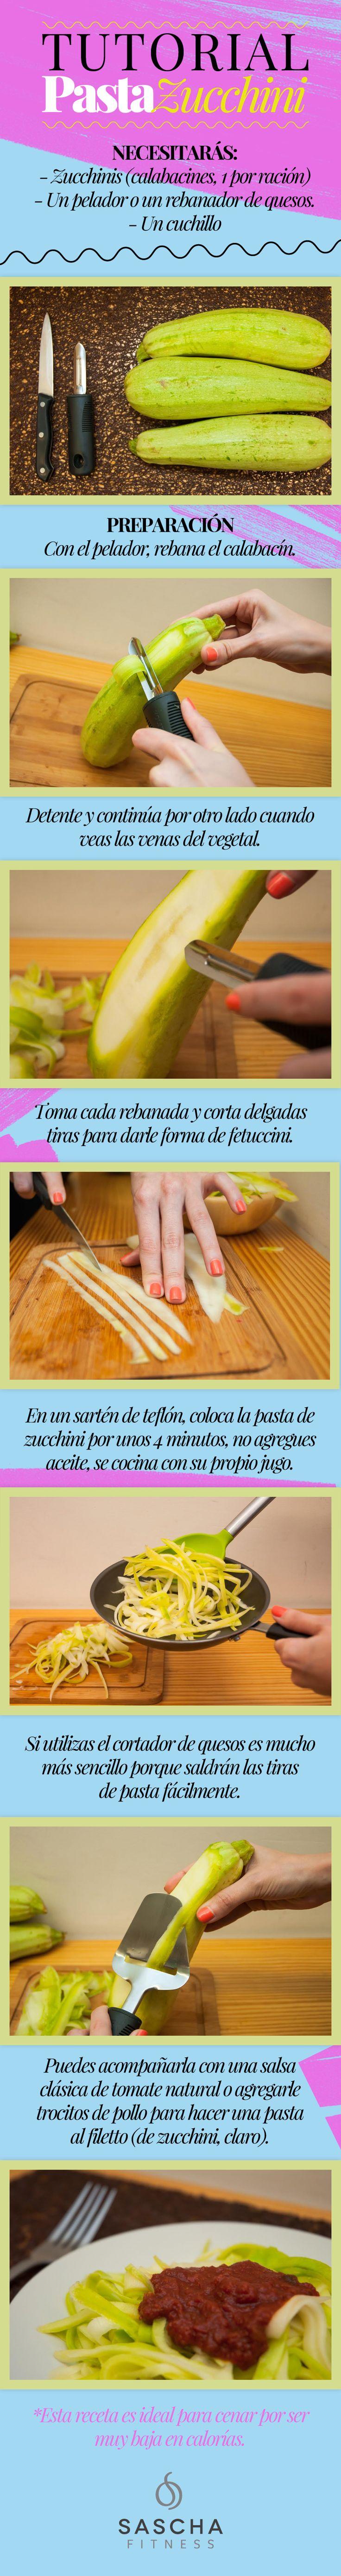 Tutorial: Pasta de zucchini